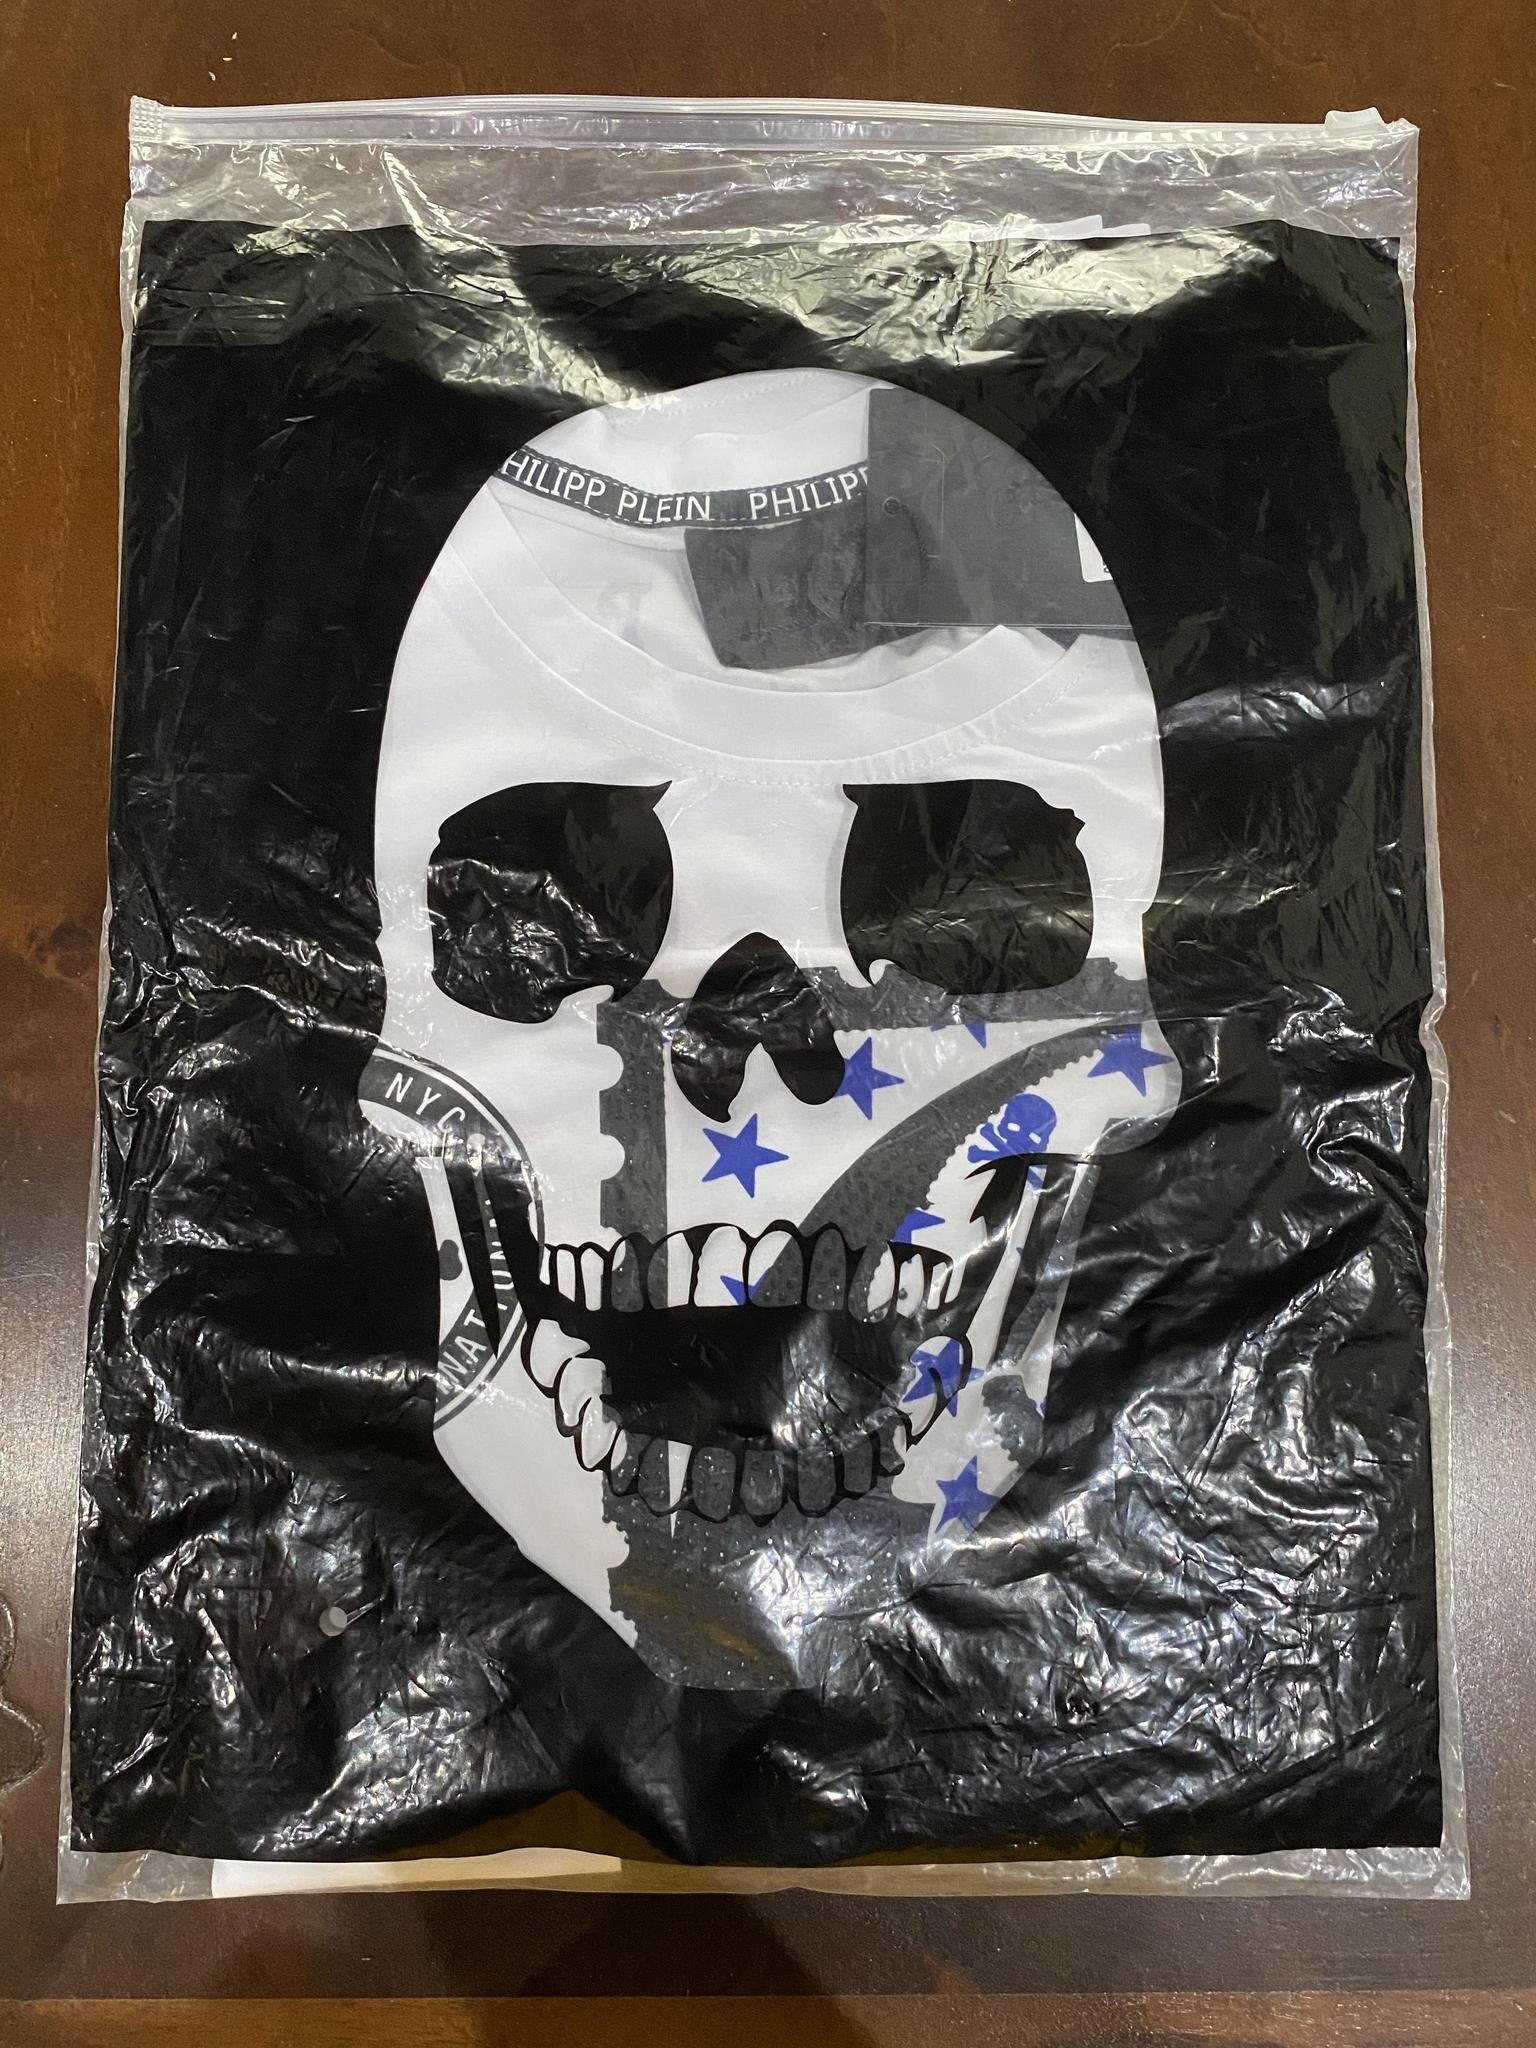 Philipp Plein T-shirt - Authentic